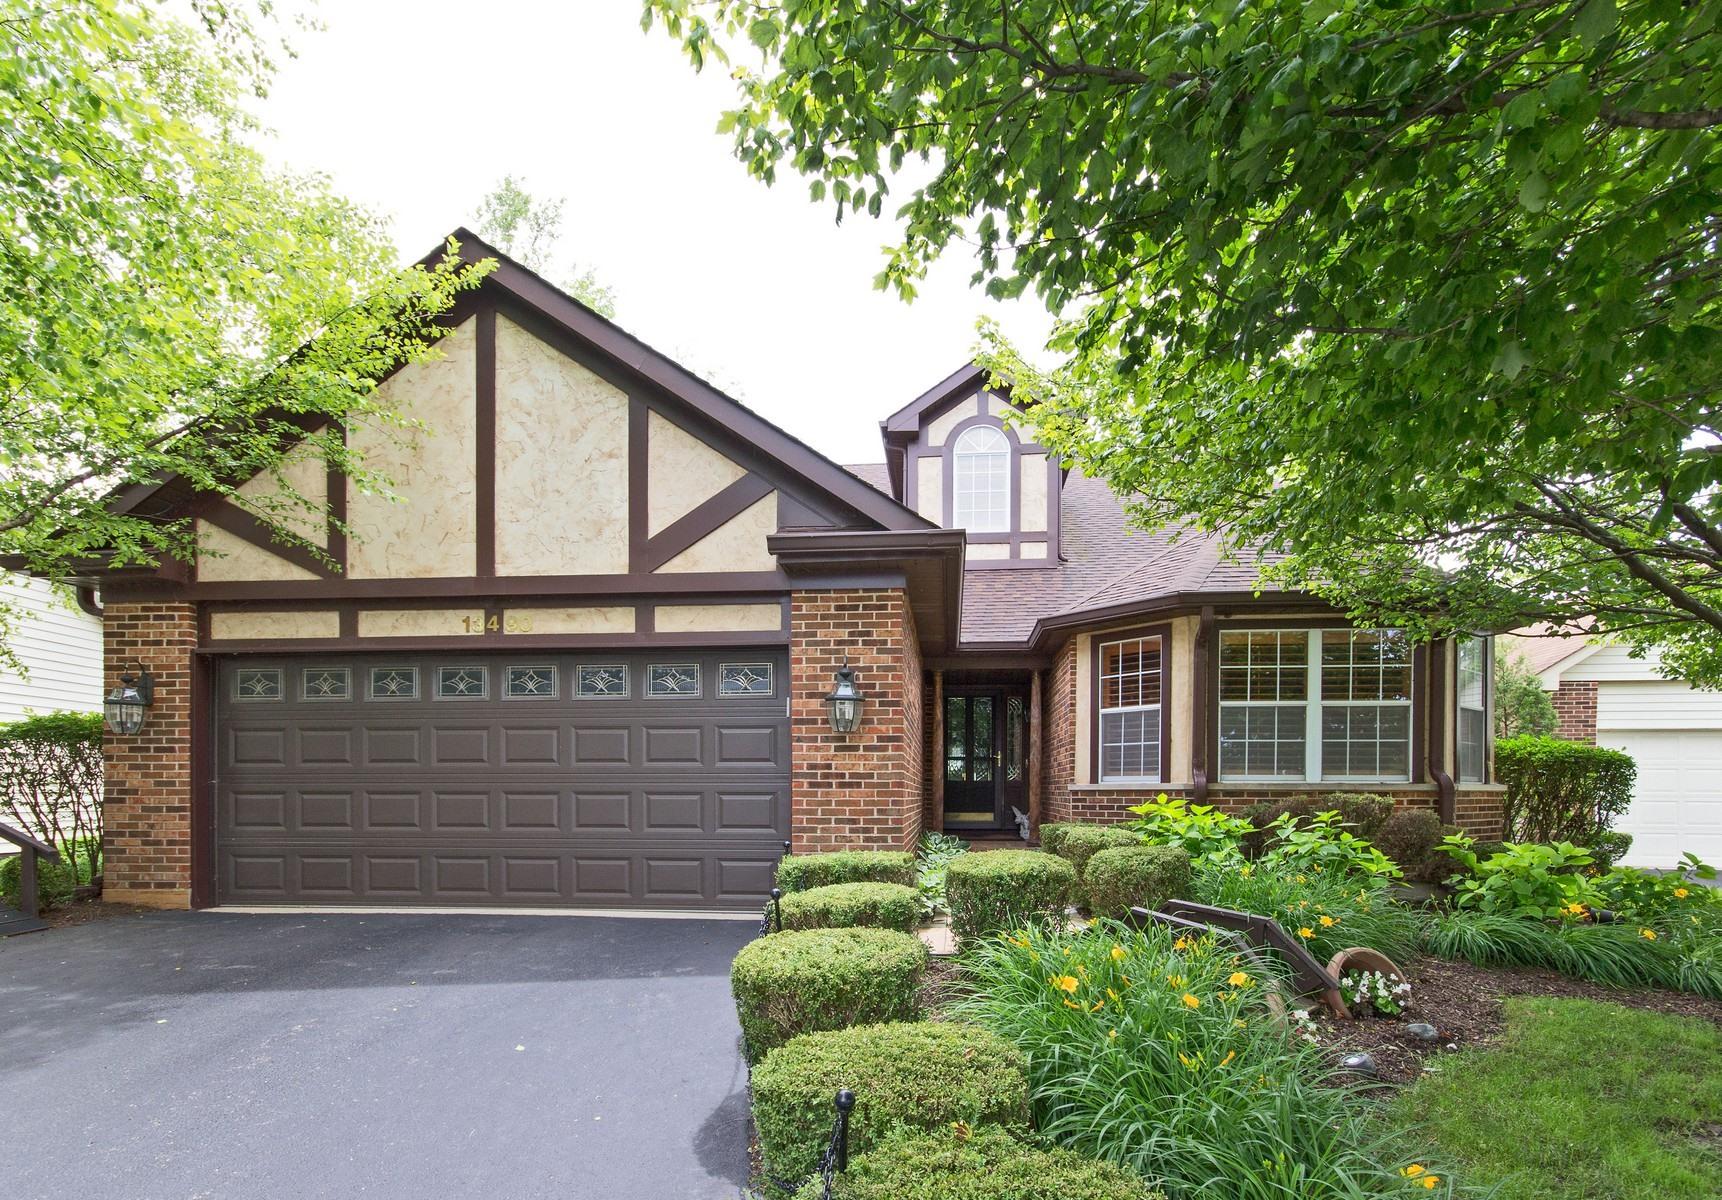 独户住宅 为 销售 在 Must See! One-of-a-Kind, Beautiful Home 13490 Redberry Circle Plainfield, 伊利诺斯州, 60544 美国